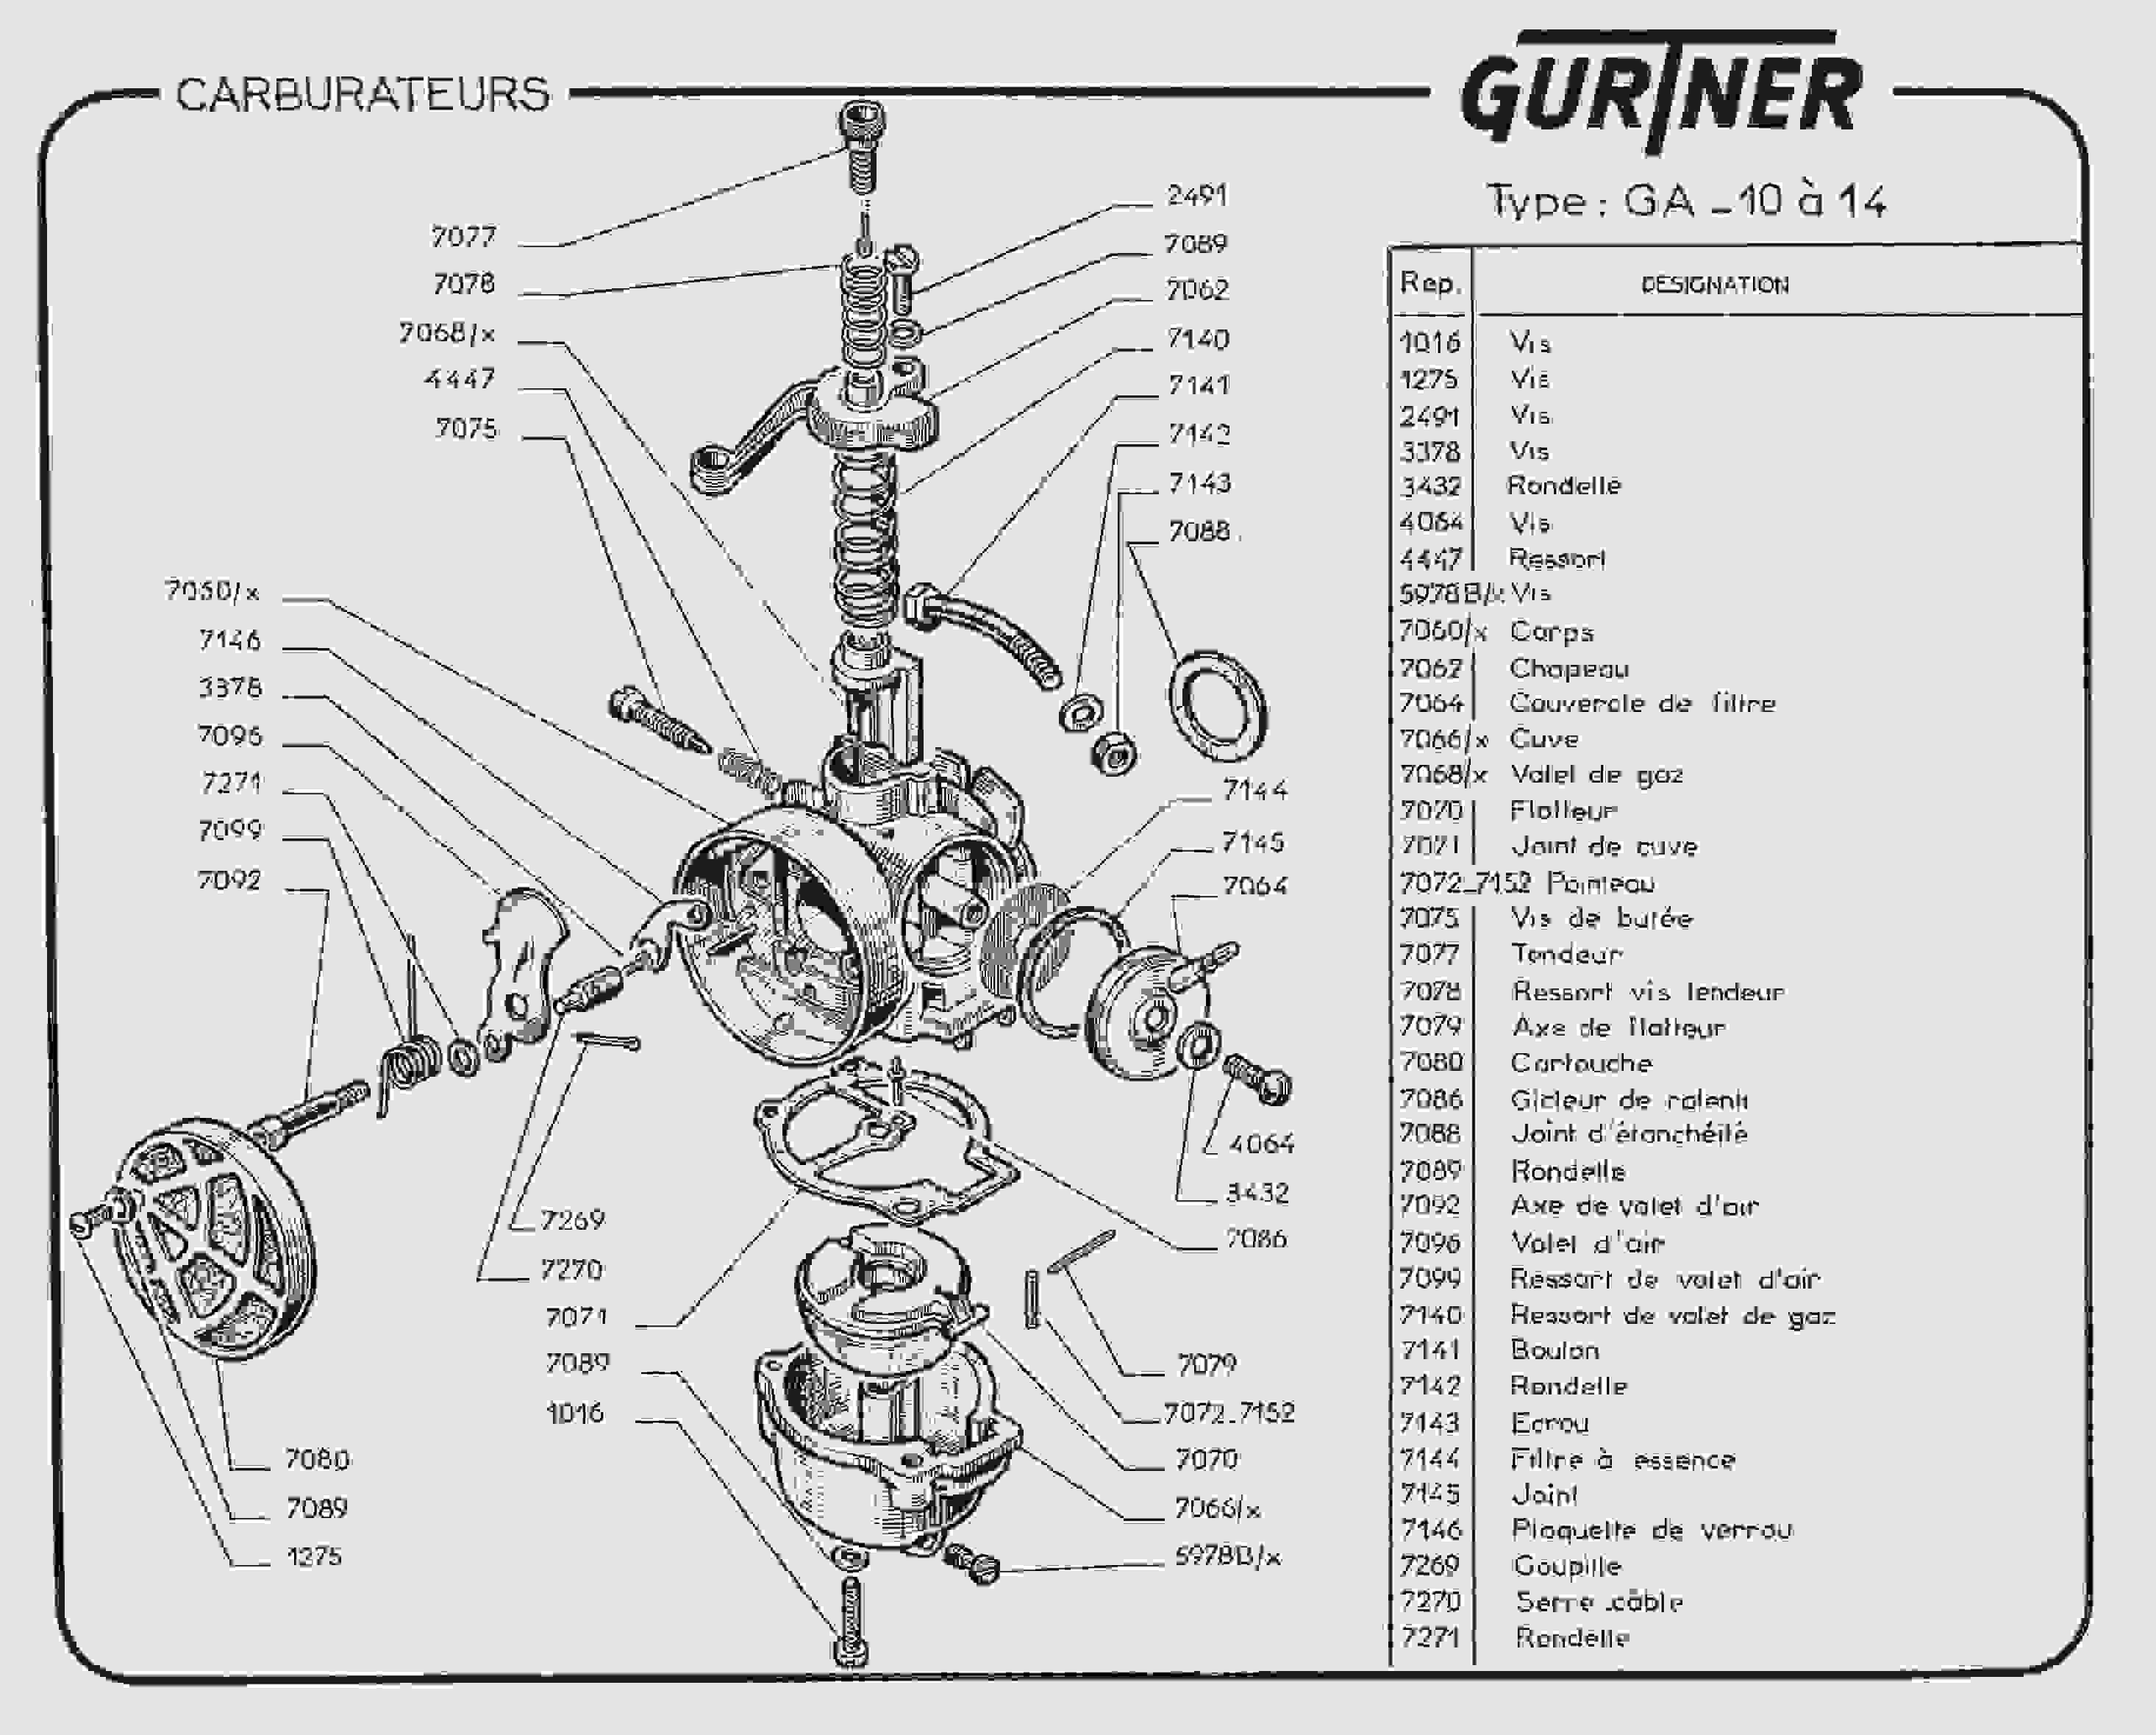 Recherche Piece Carbu Gurtner Ga14 Ga720 Ou Carbu Complet